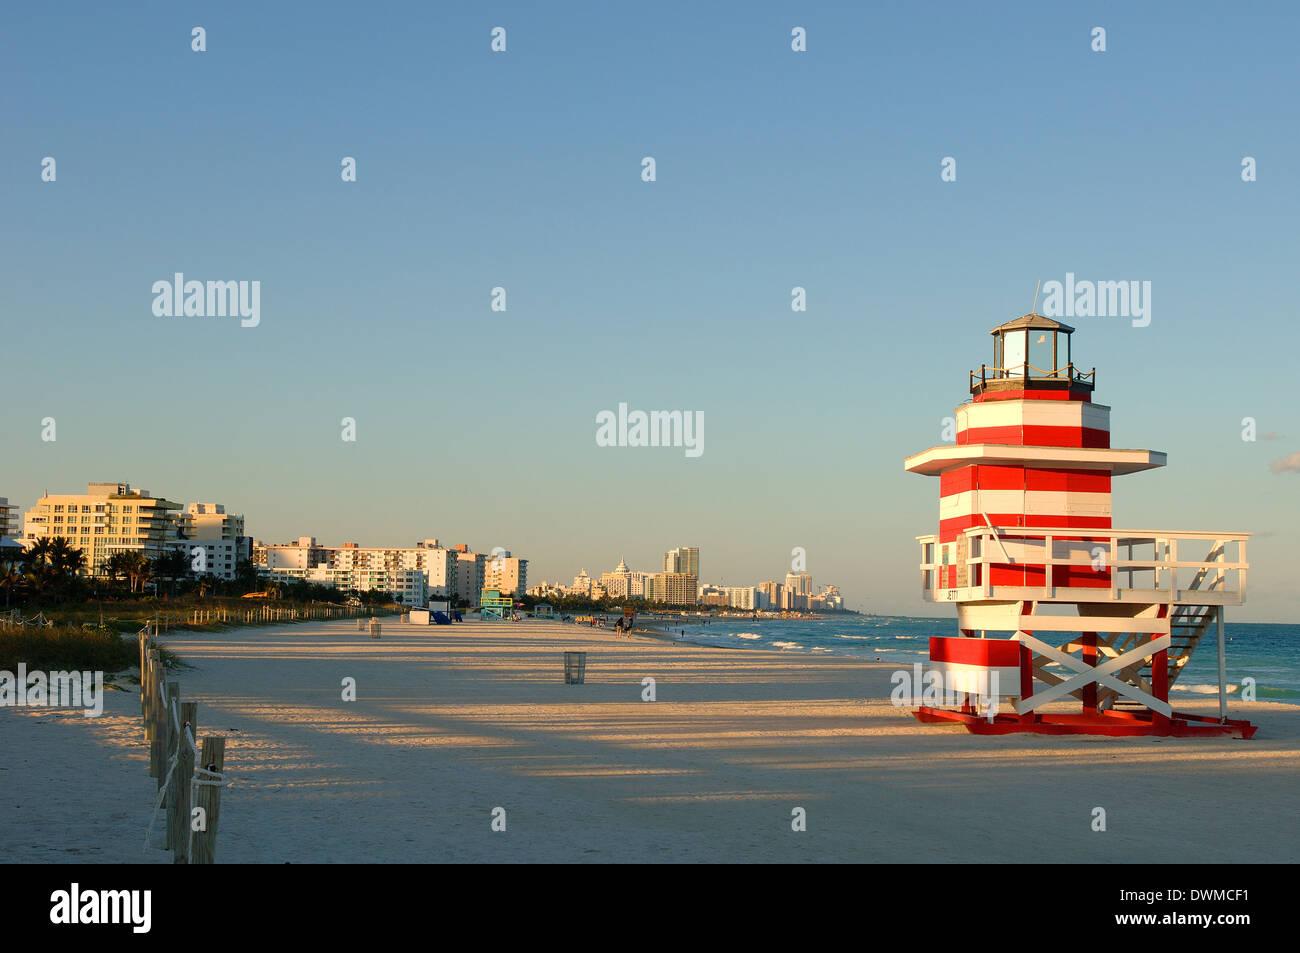 South Beach, Miami, Florida, United States of America, North America - Stock Image